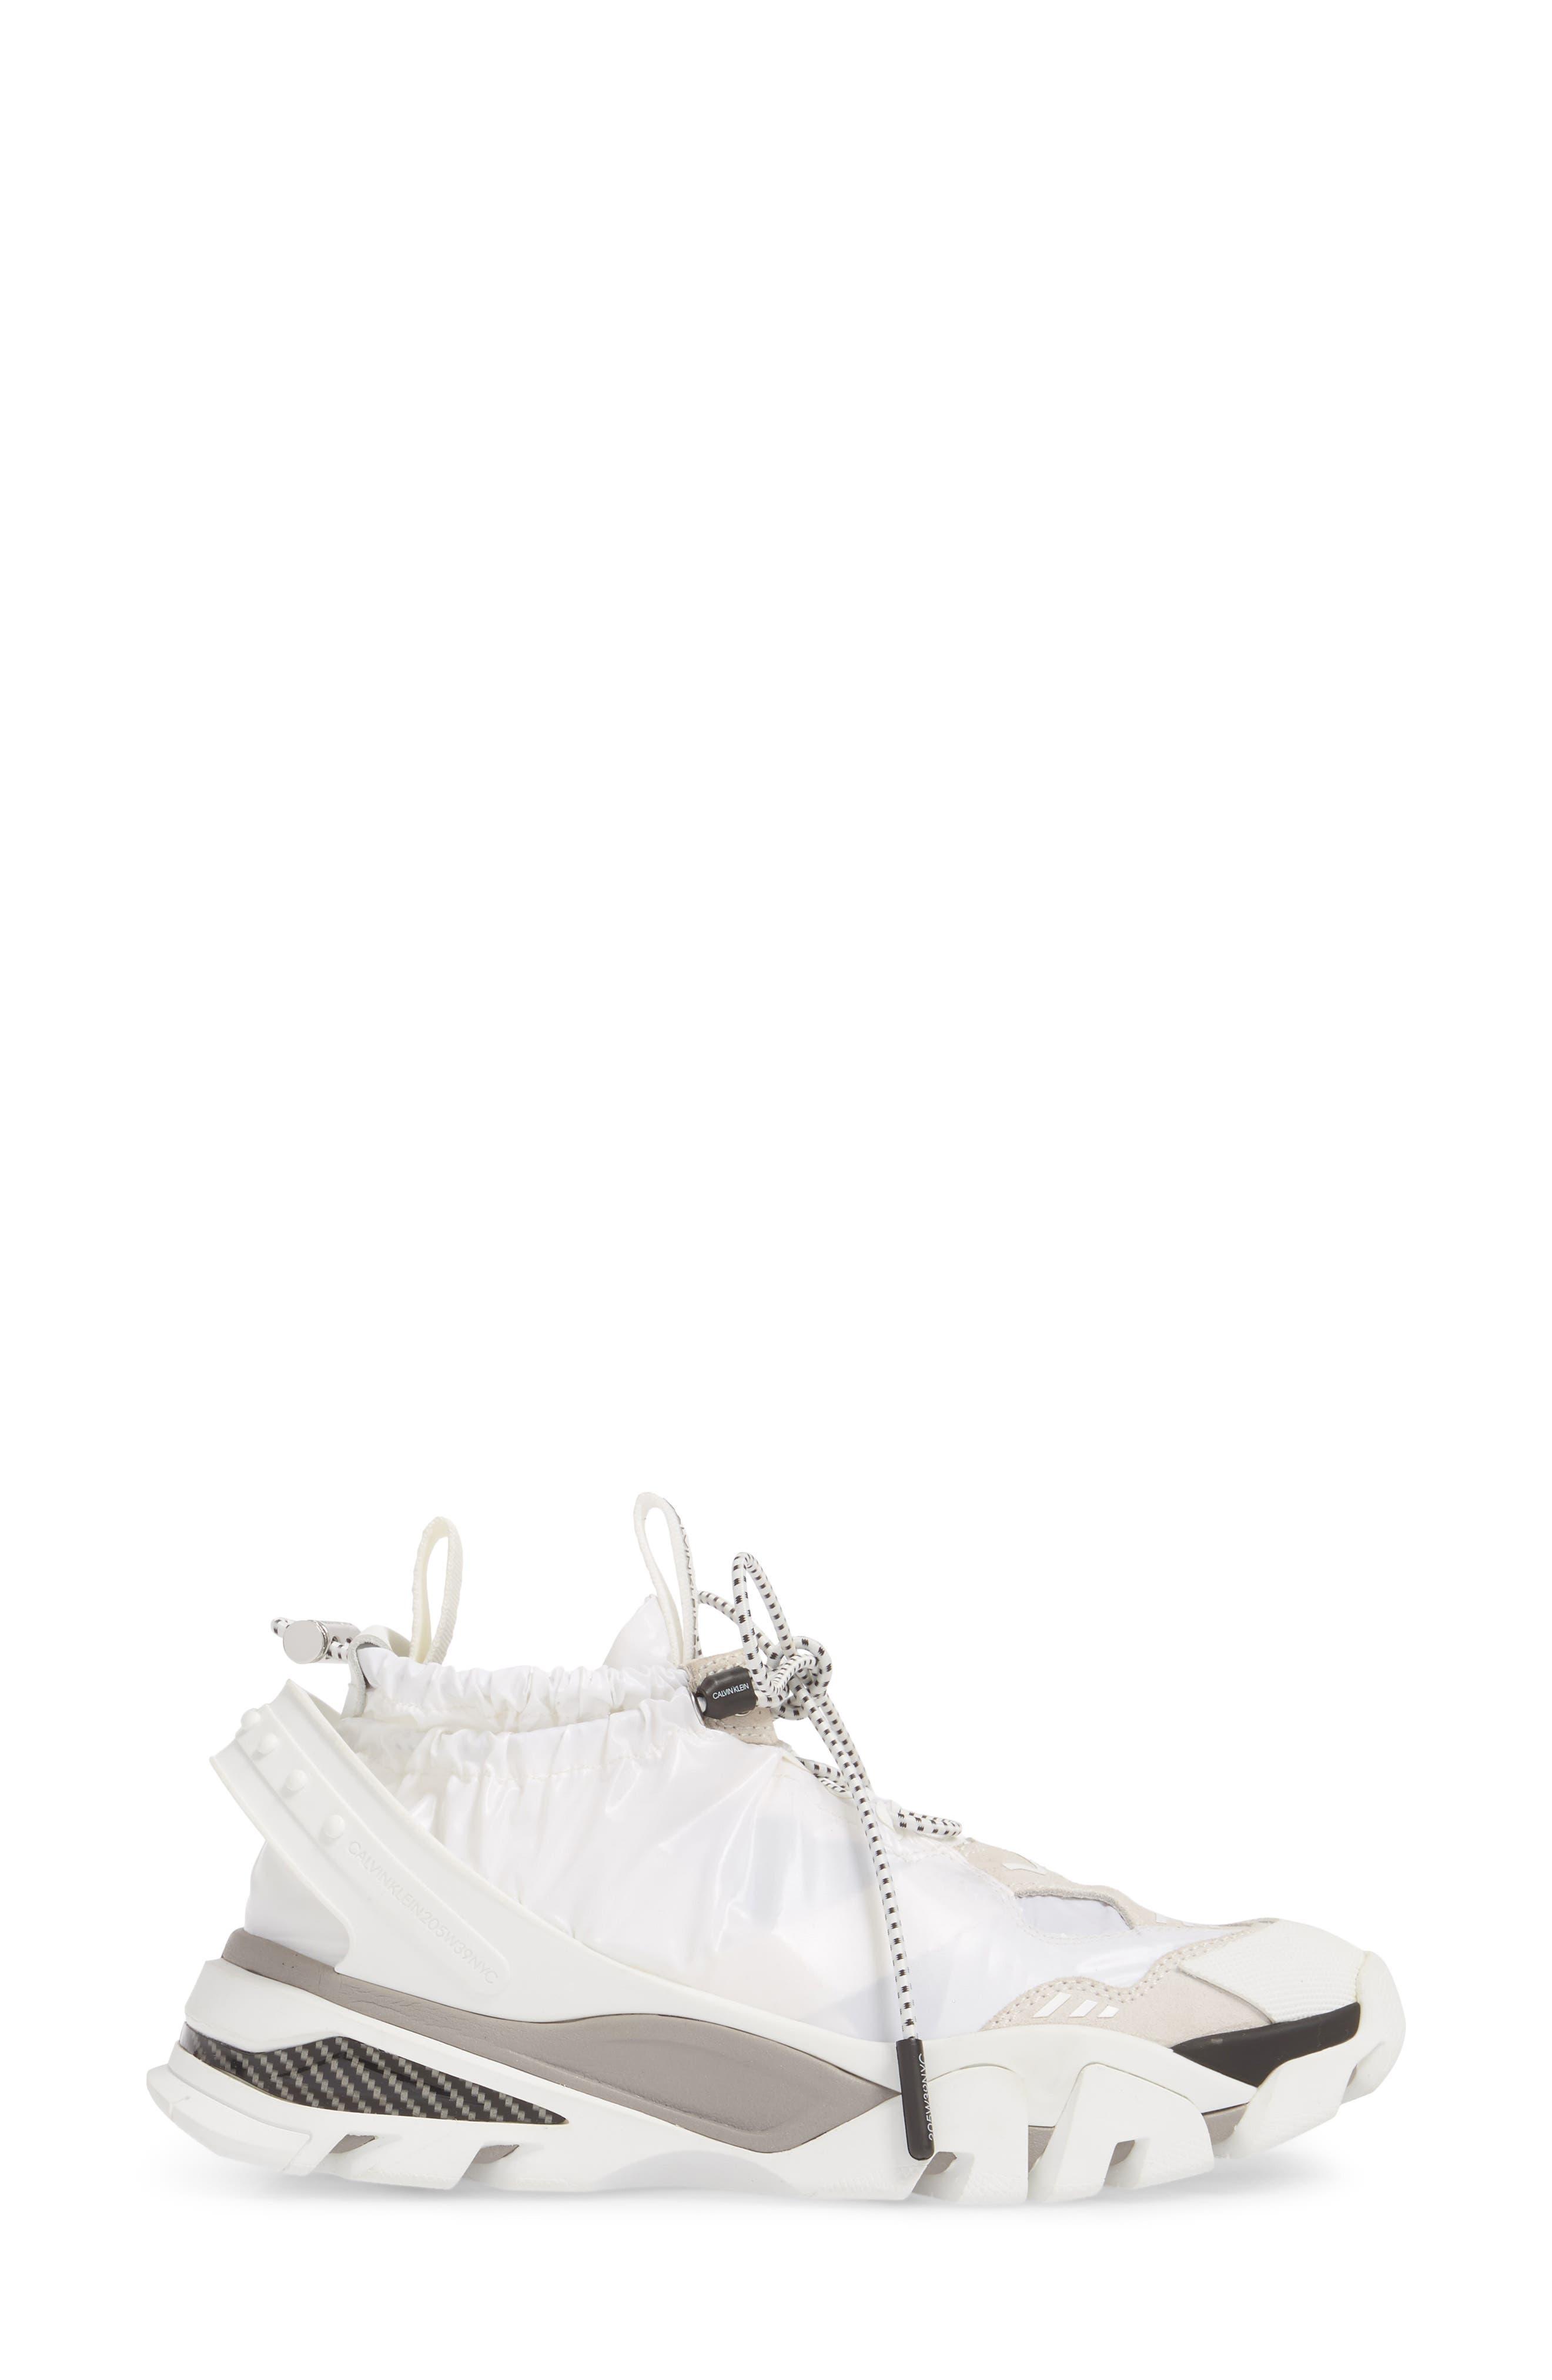 CALVIN KLEIN 205W39NYC,                             Candessa Slip-On Sneaker,                             Alternate thumbnail 3, color,                             100